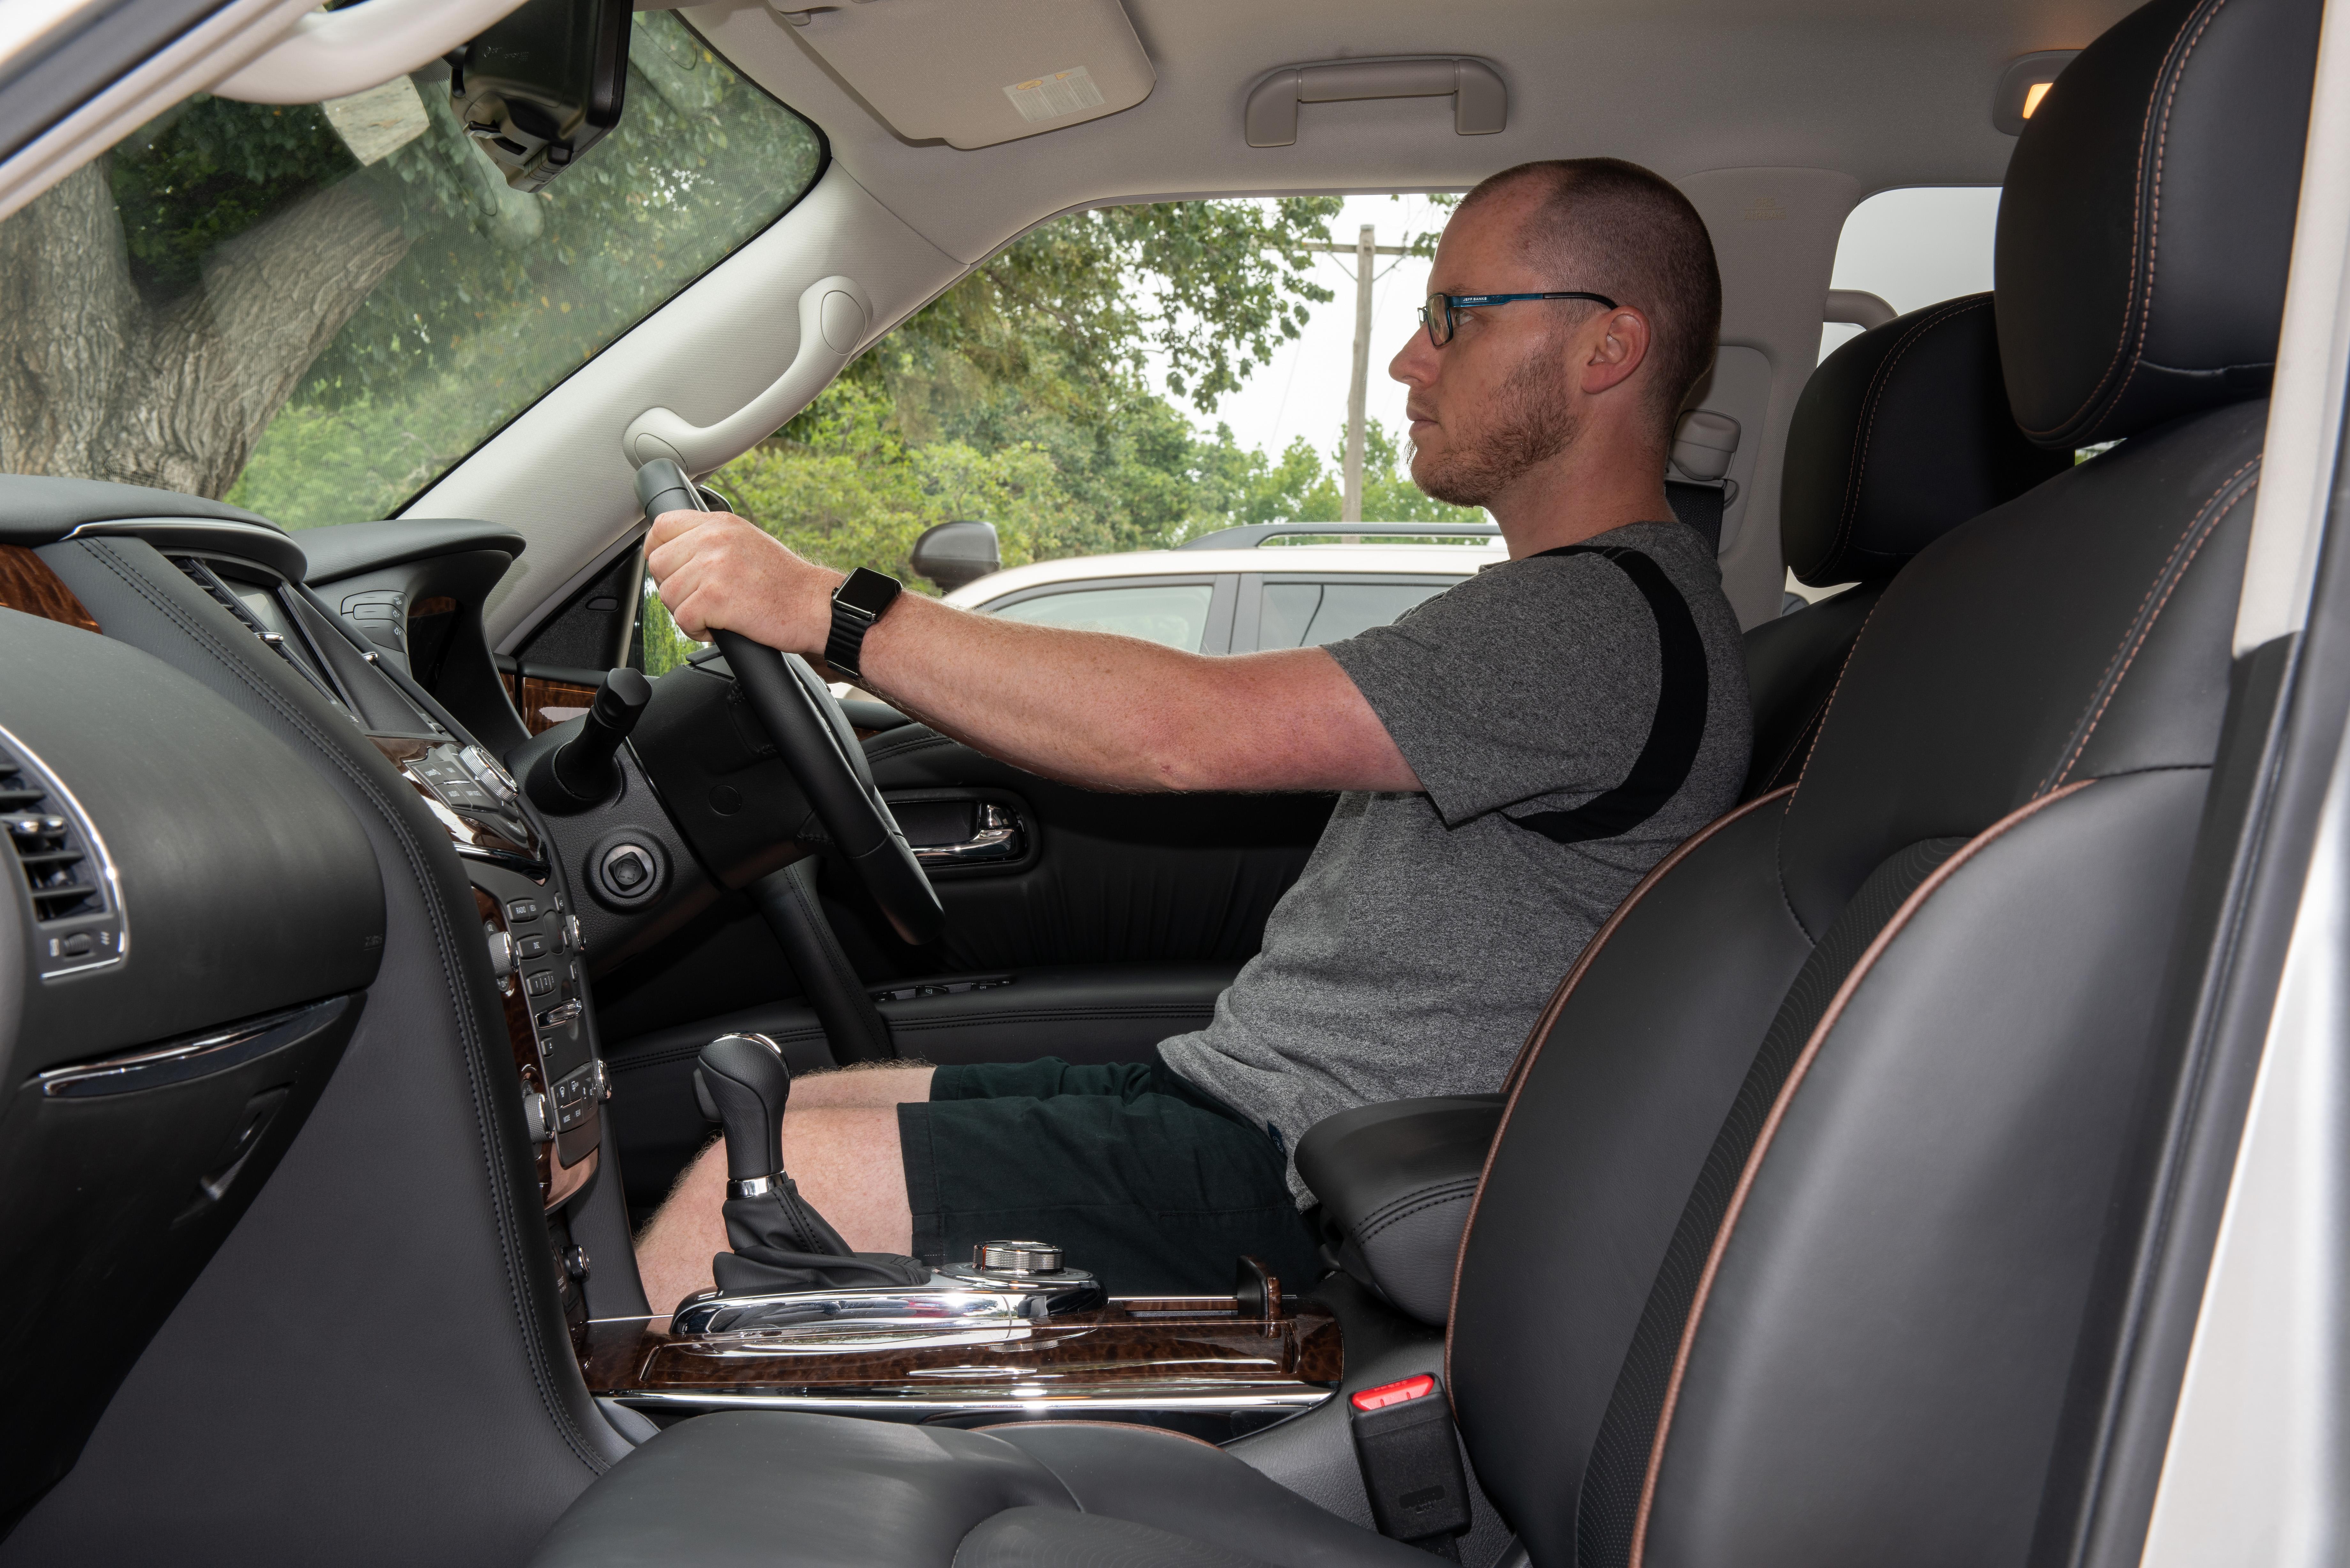 2019 Nissan Patrol Ti-L review | CarAdvice